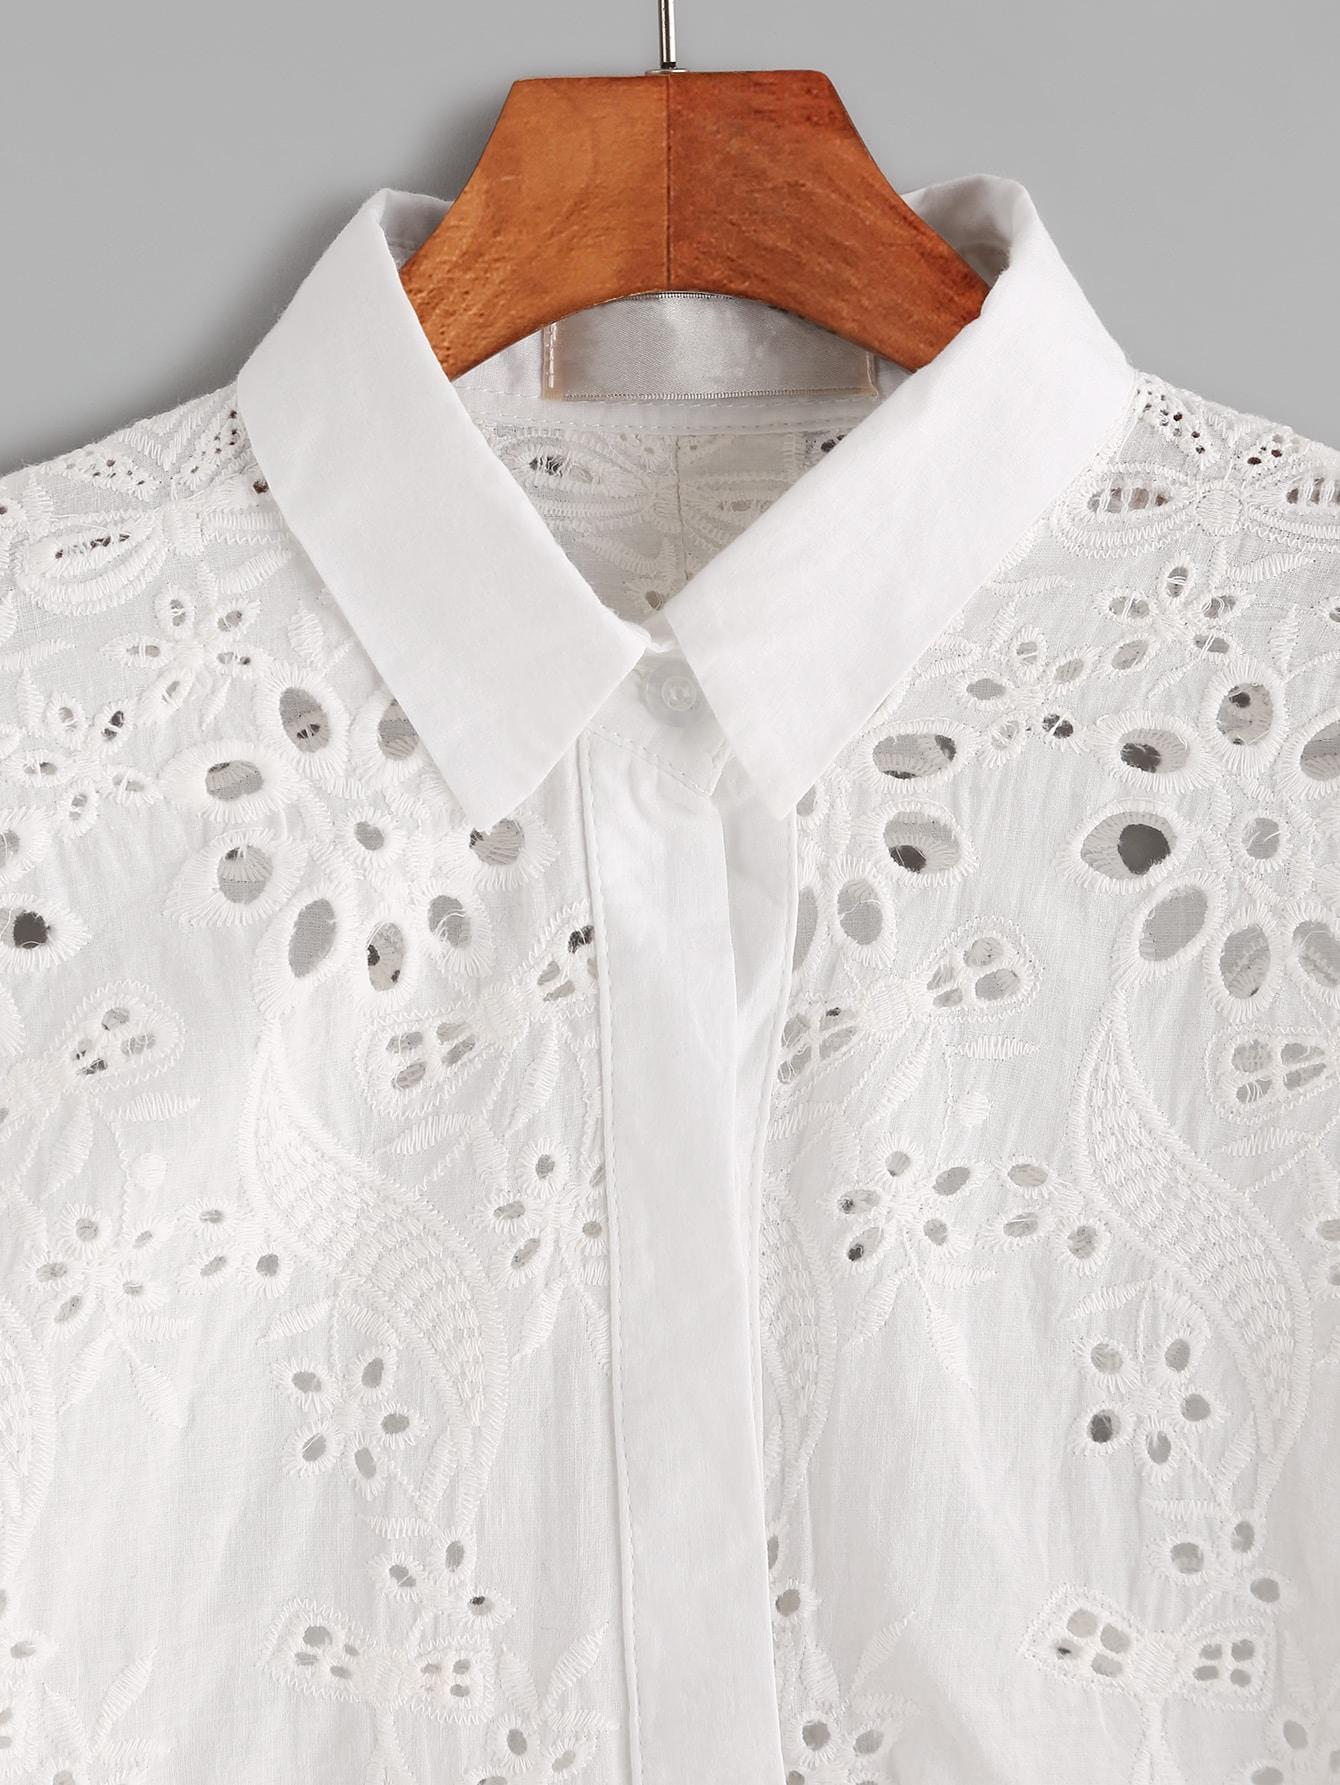 blouse161227101_2